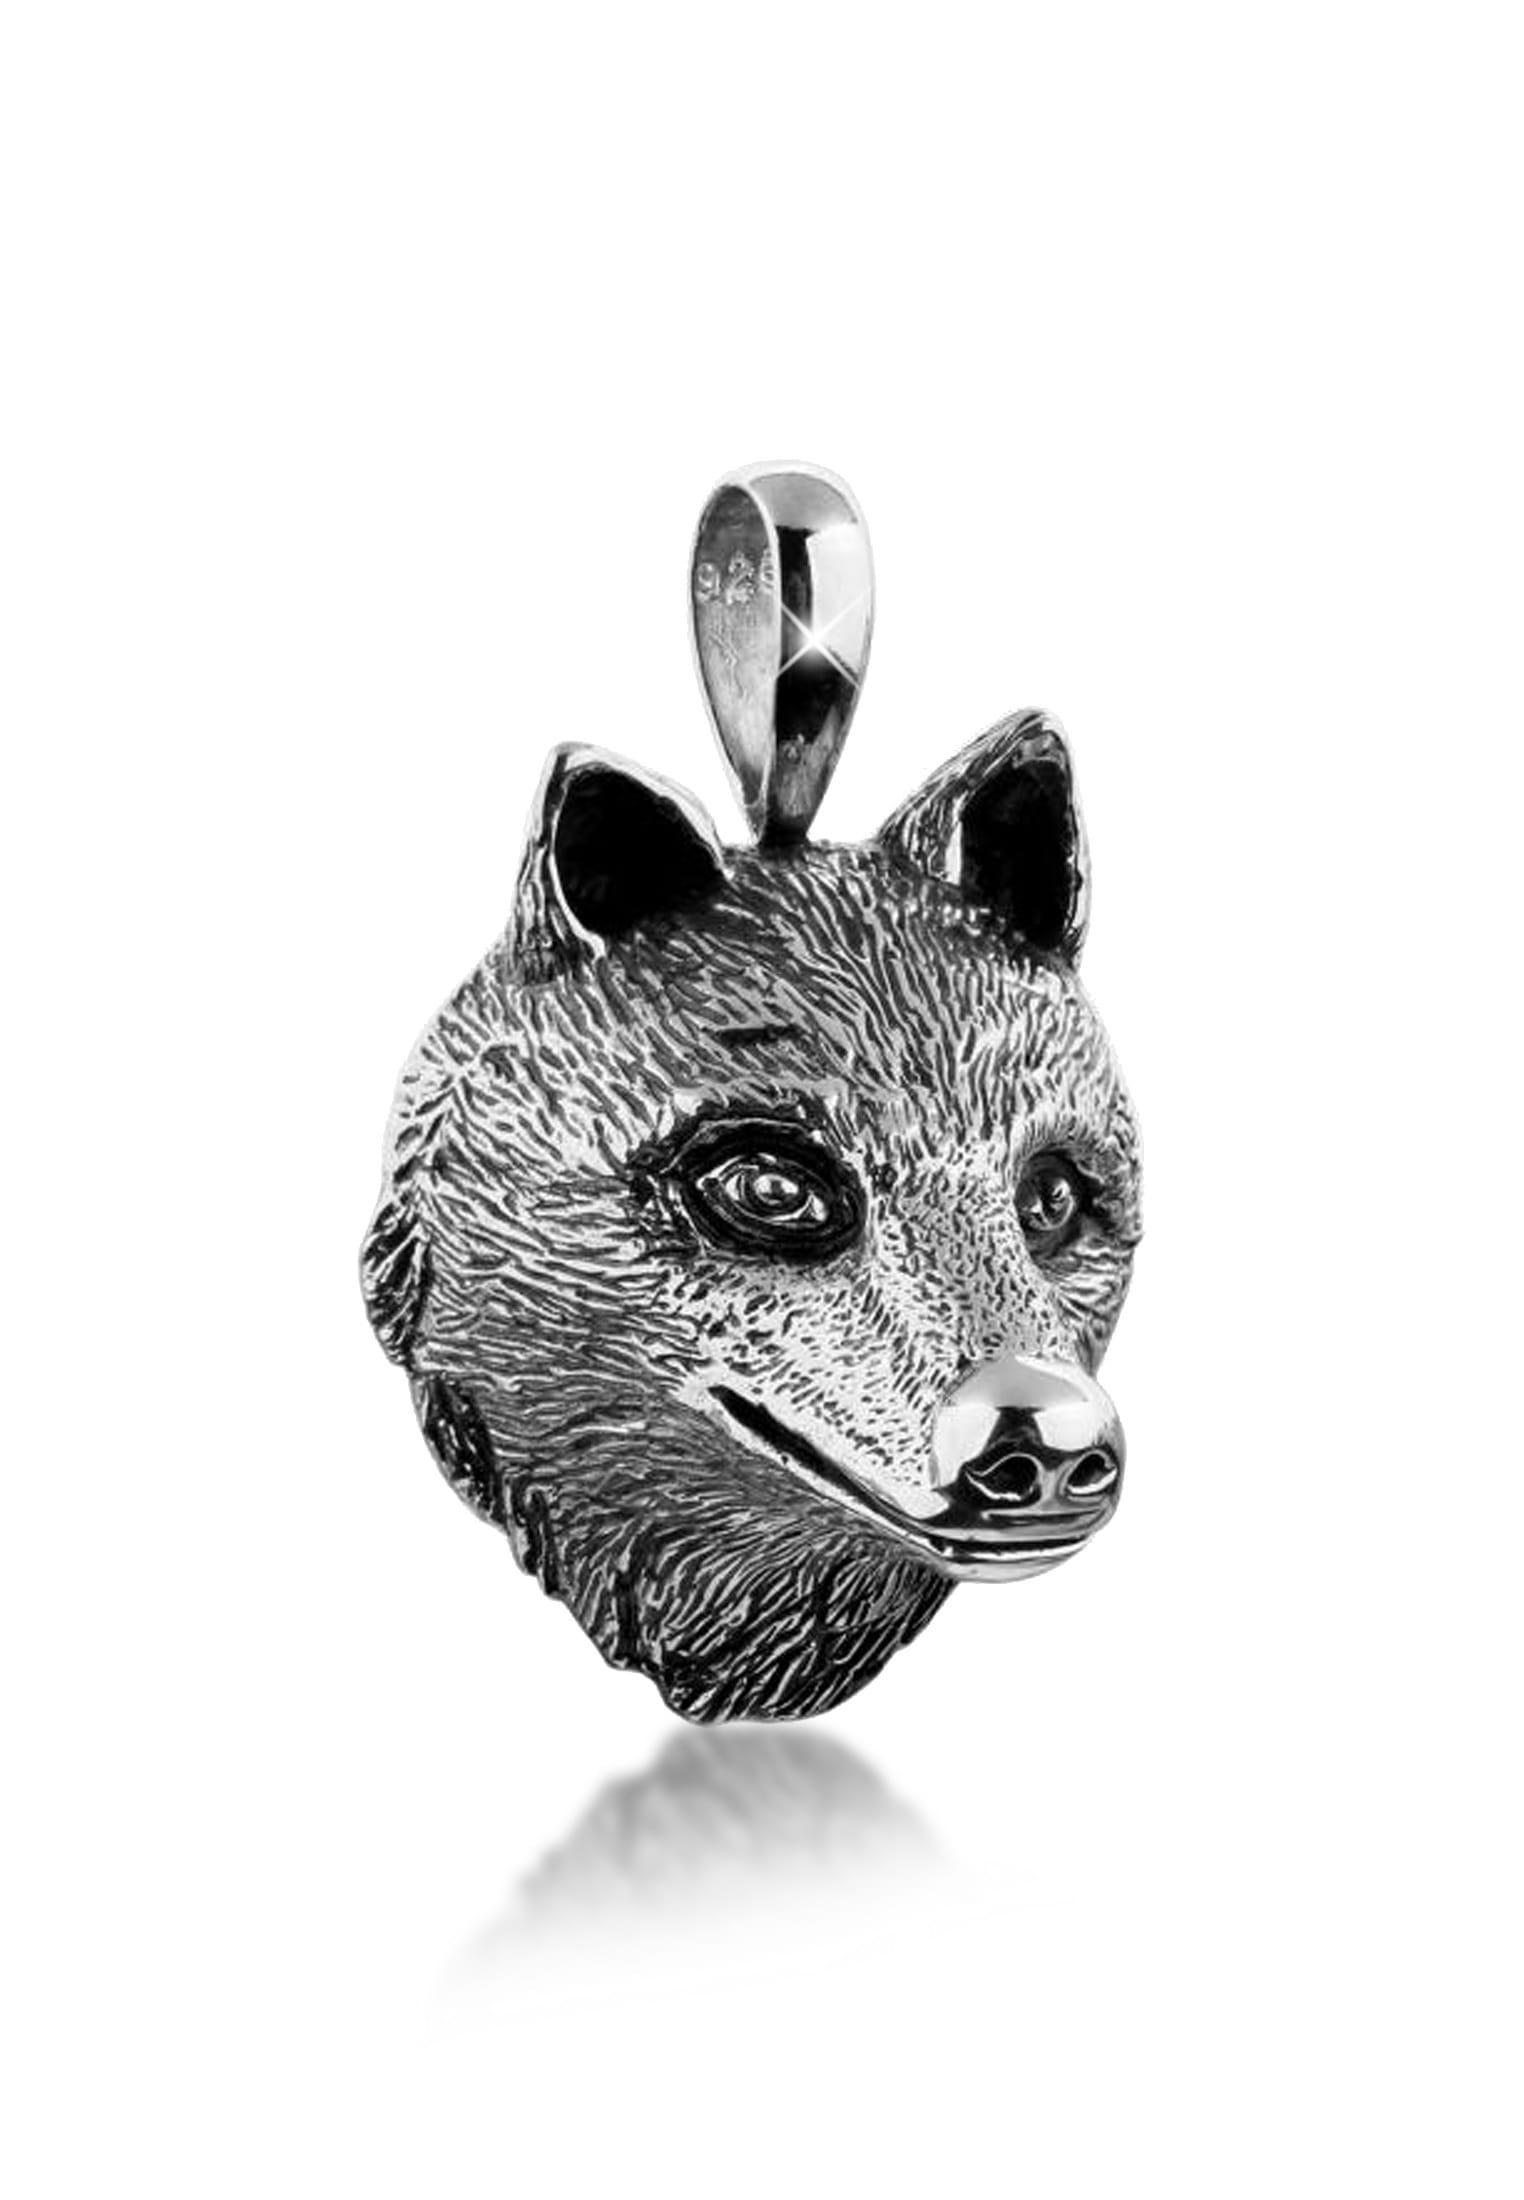 Kuzzoi Kettenanhänger Herren Kettenanhänger Wolfkopf Robust 925 Silber | Schmuck > Halsketten | Kuzzoi